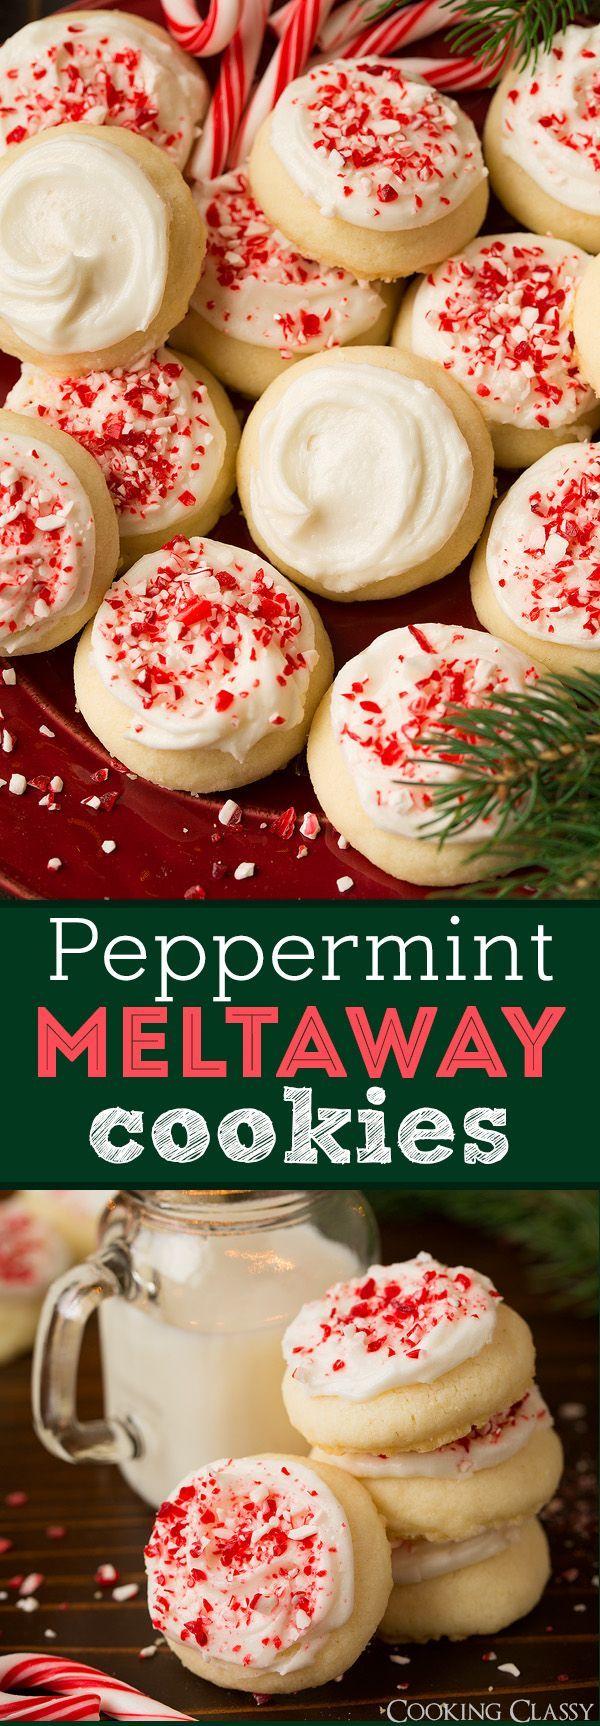 Peppermint Meltaway Cookies - A Christmas season MUST! They literally melt in your mouth.  Gezonde lekkere recept ideeen vind je op https://gezondvoorstel.com . #gezondeten #gezondrecept #recept #eten #lekkereten #ontbijt #lunch #avondeten